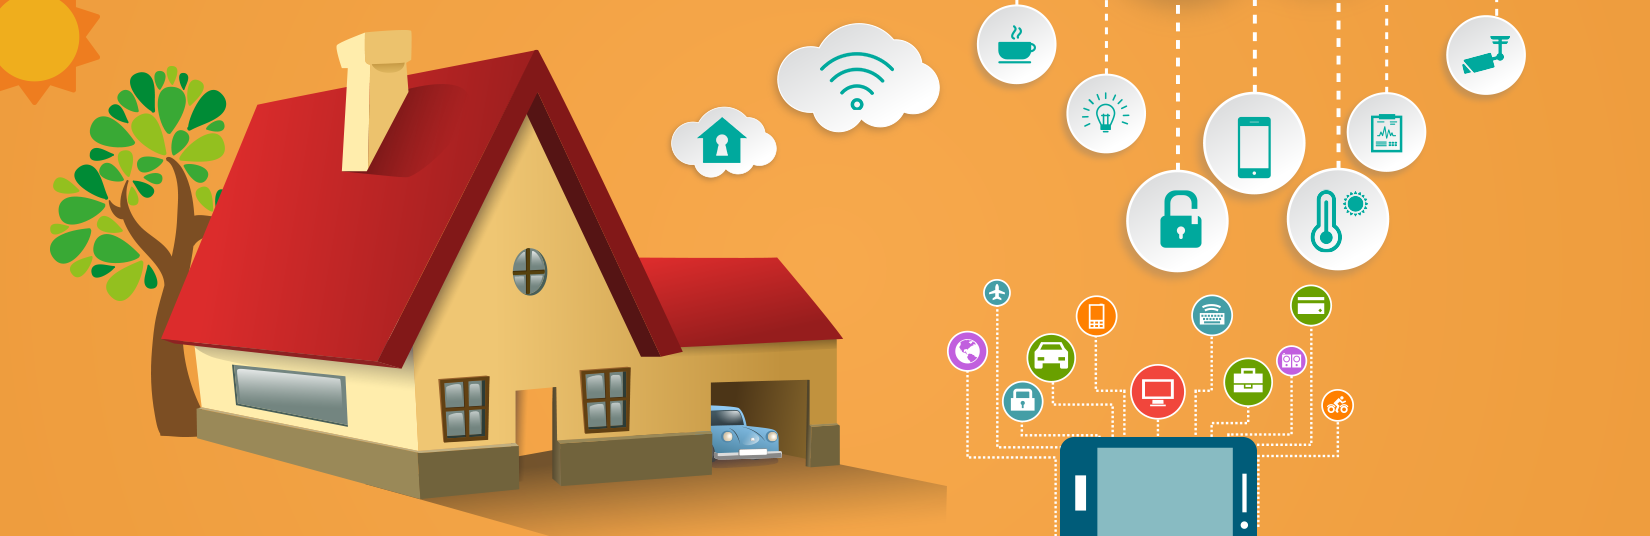 Home-Automation-App-Development